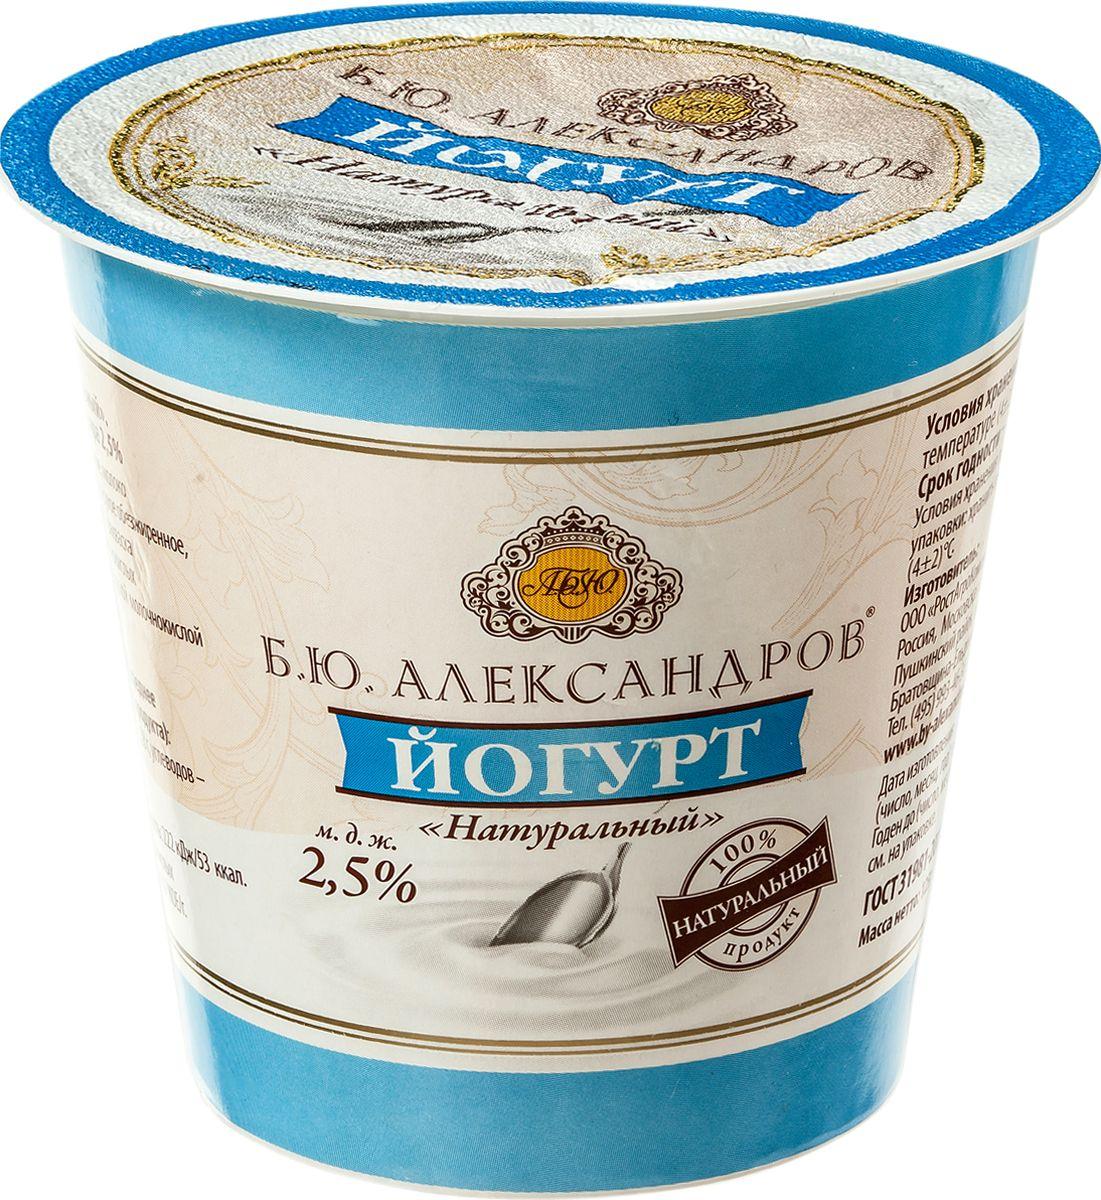 Б.Ю.Александров Йогурт Натуральный 2,5%,125 г ростагроэкспорт желе ананас 125 г